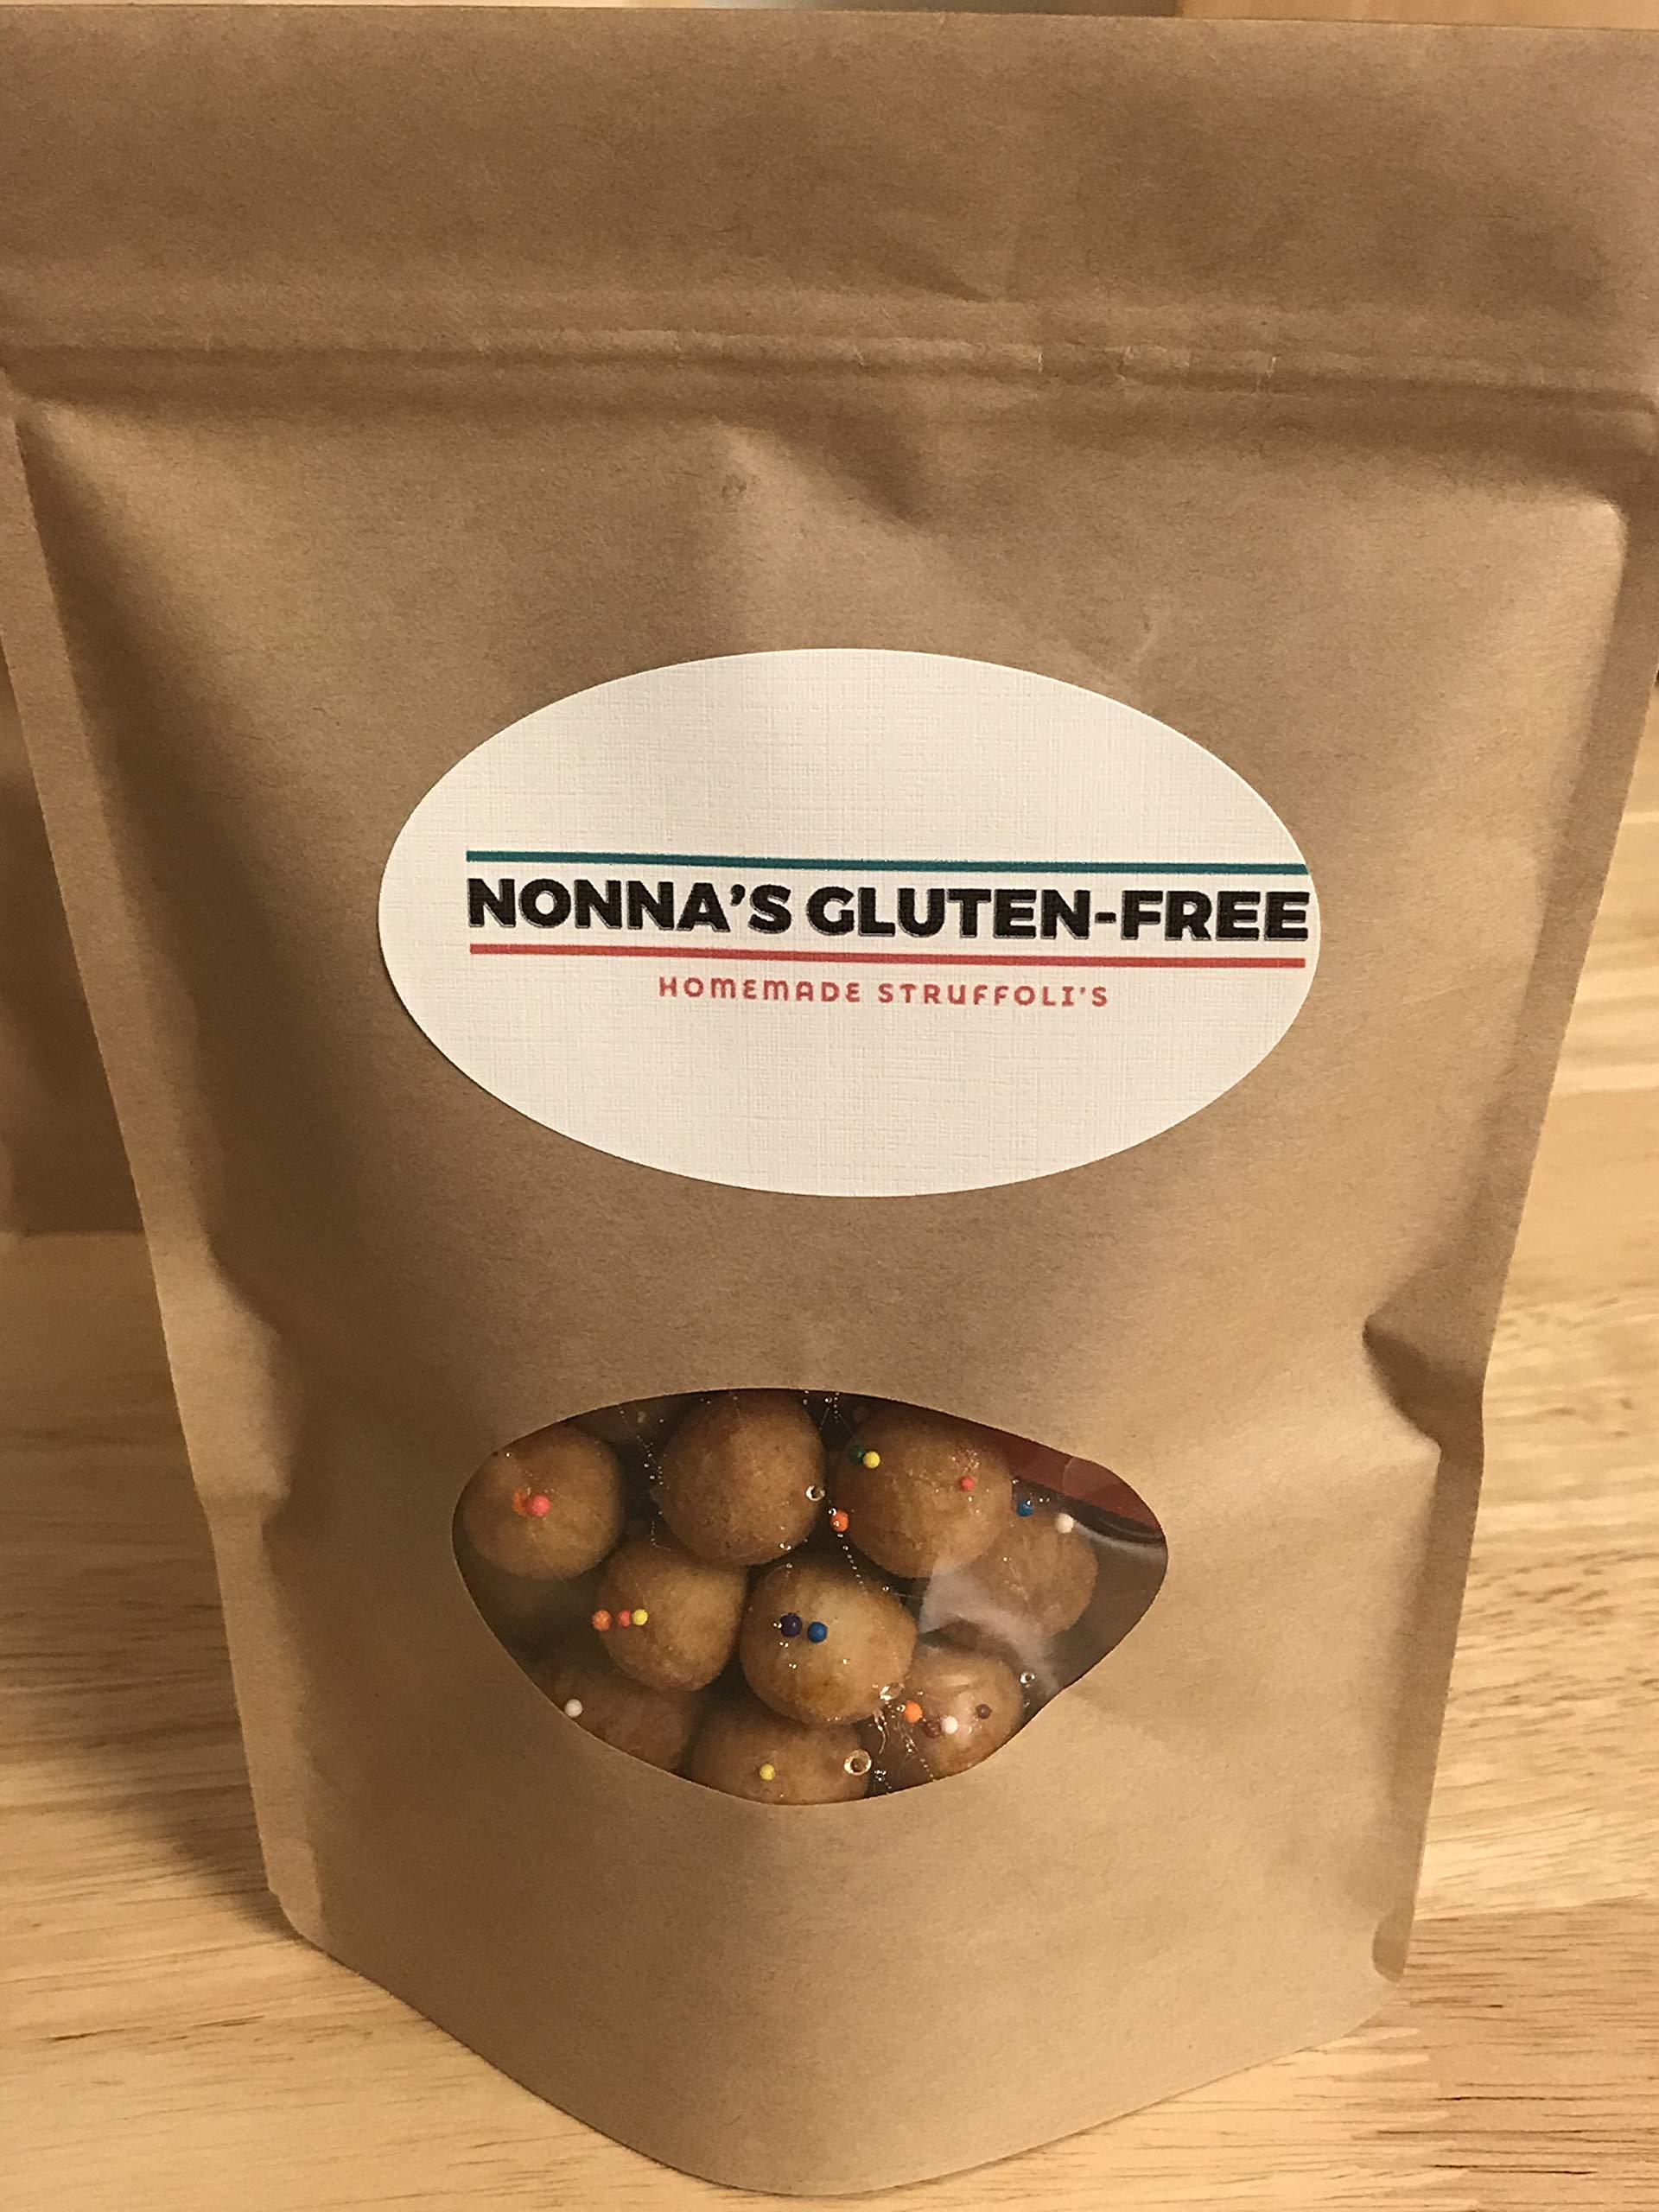 Nonna's Gluten Free Struffoli